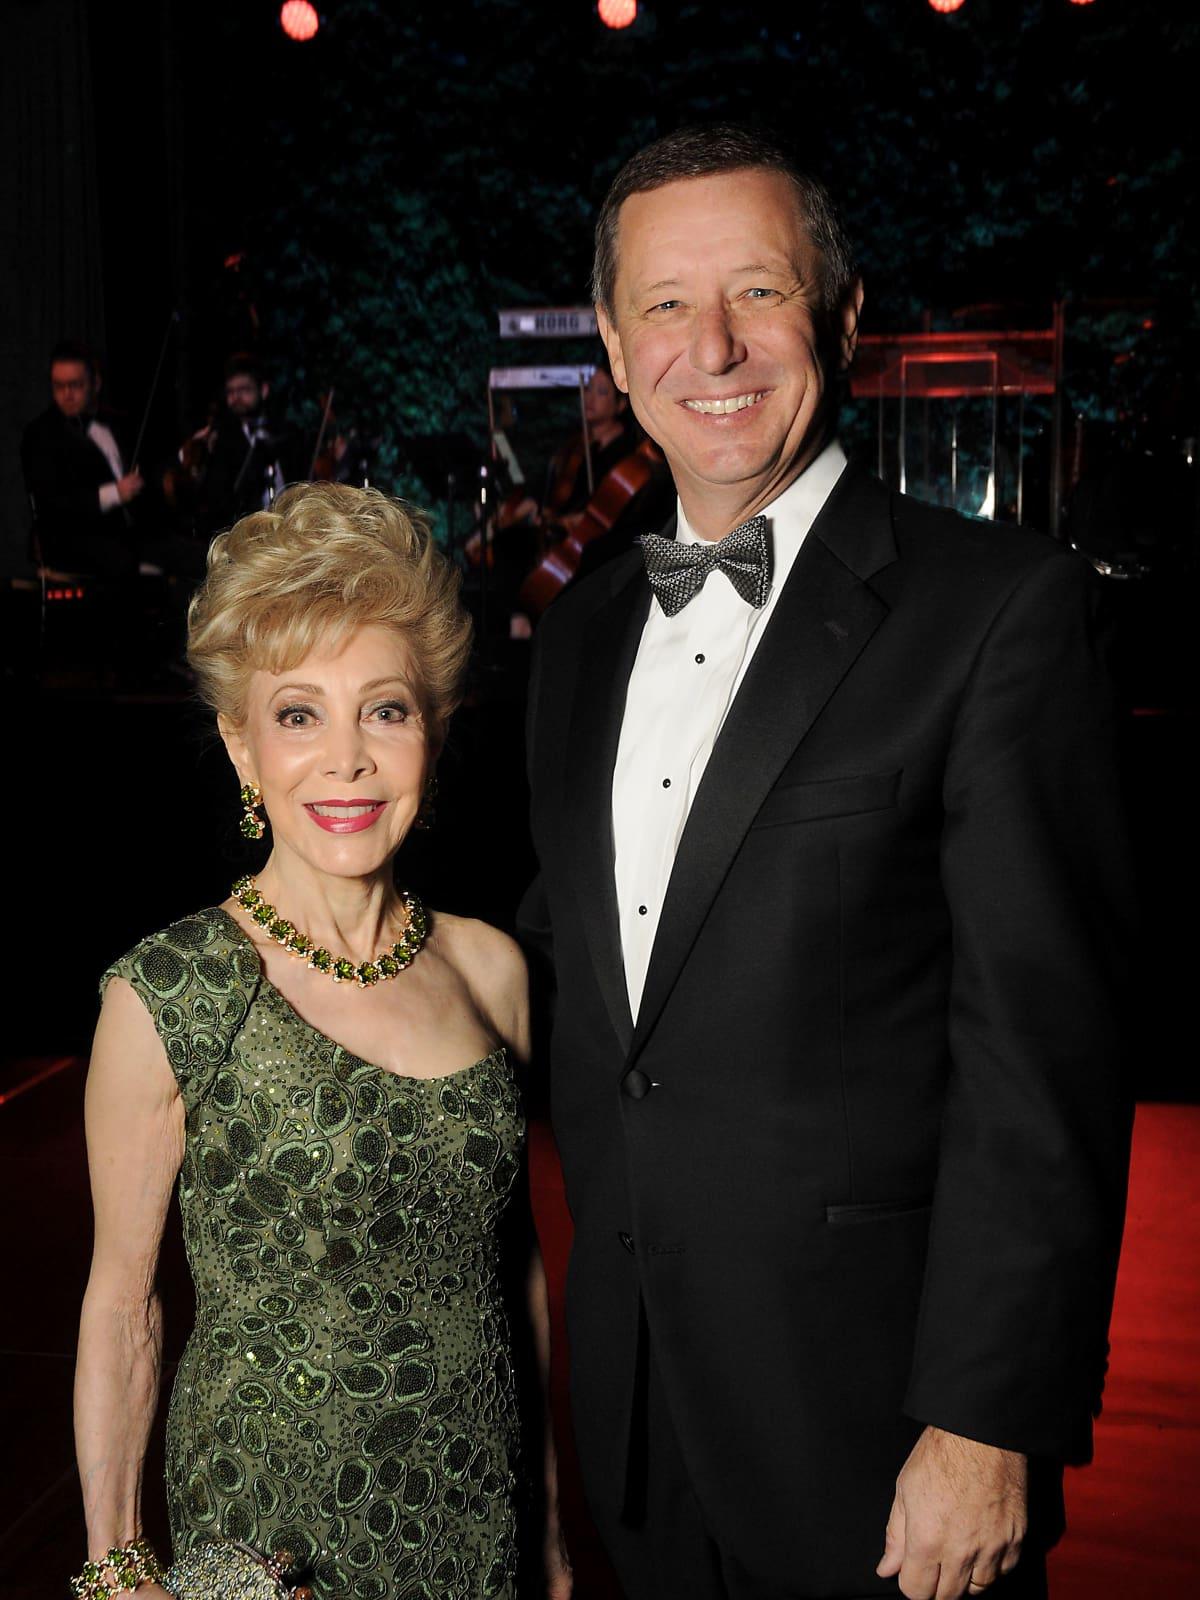 Discovery Green, Gala on the Green, Feb. 2016,  Margaret Alkek Williams, David Wuthrich